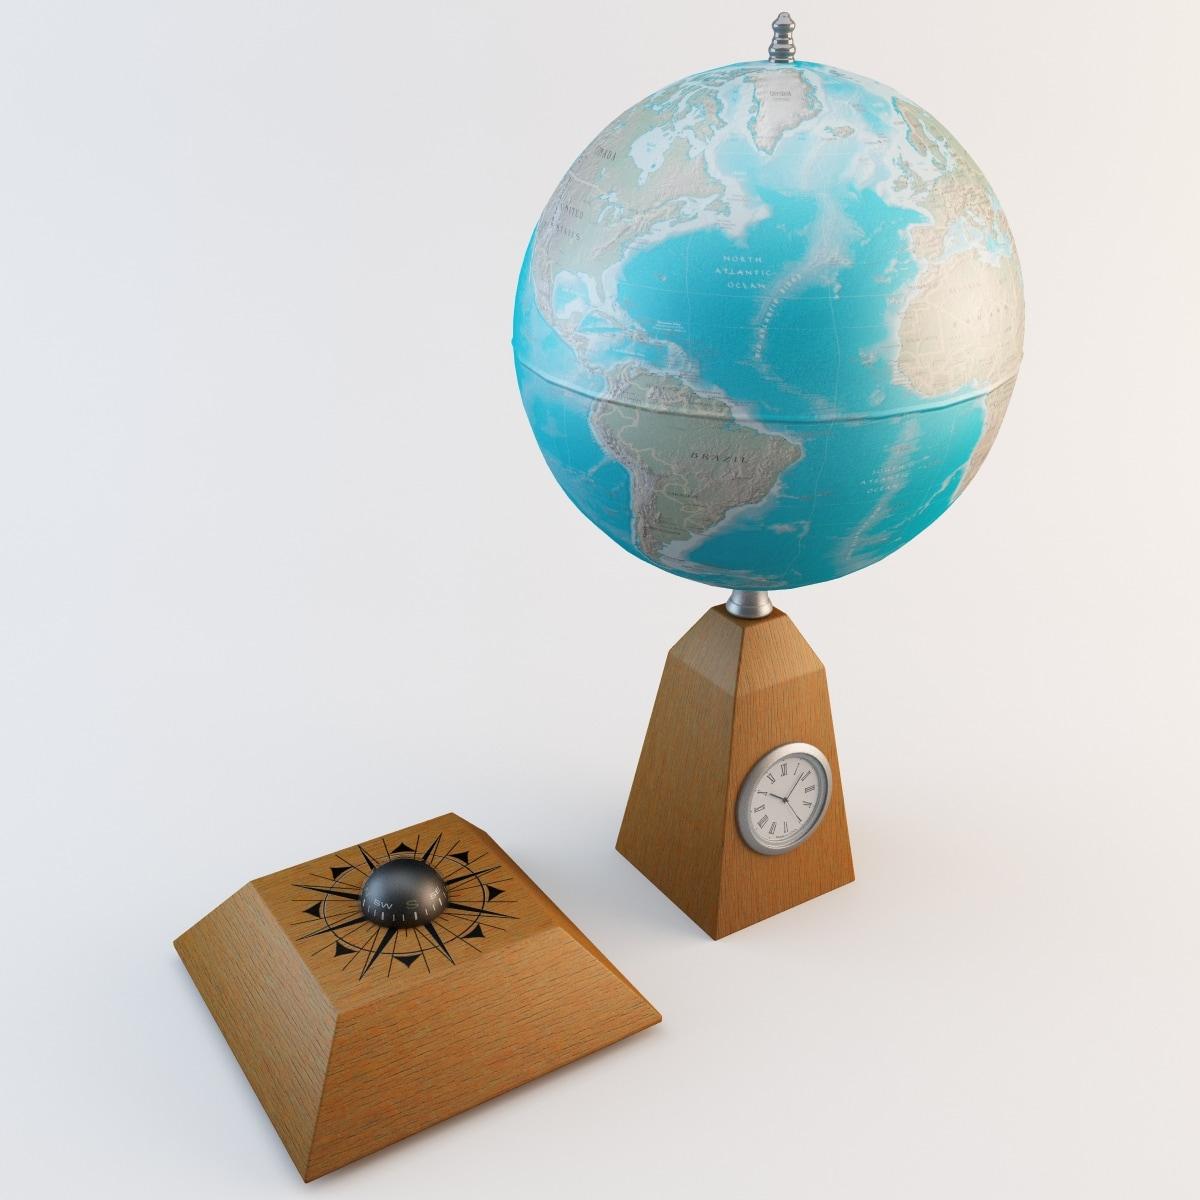 Desk_Globe_with_Clock_2_005.jpg